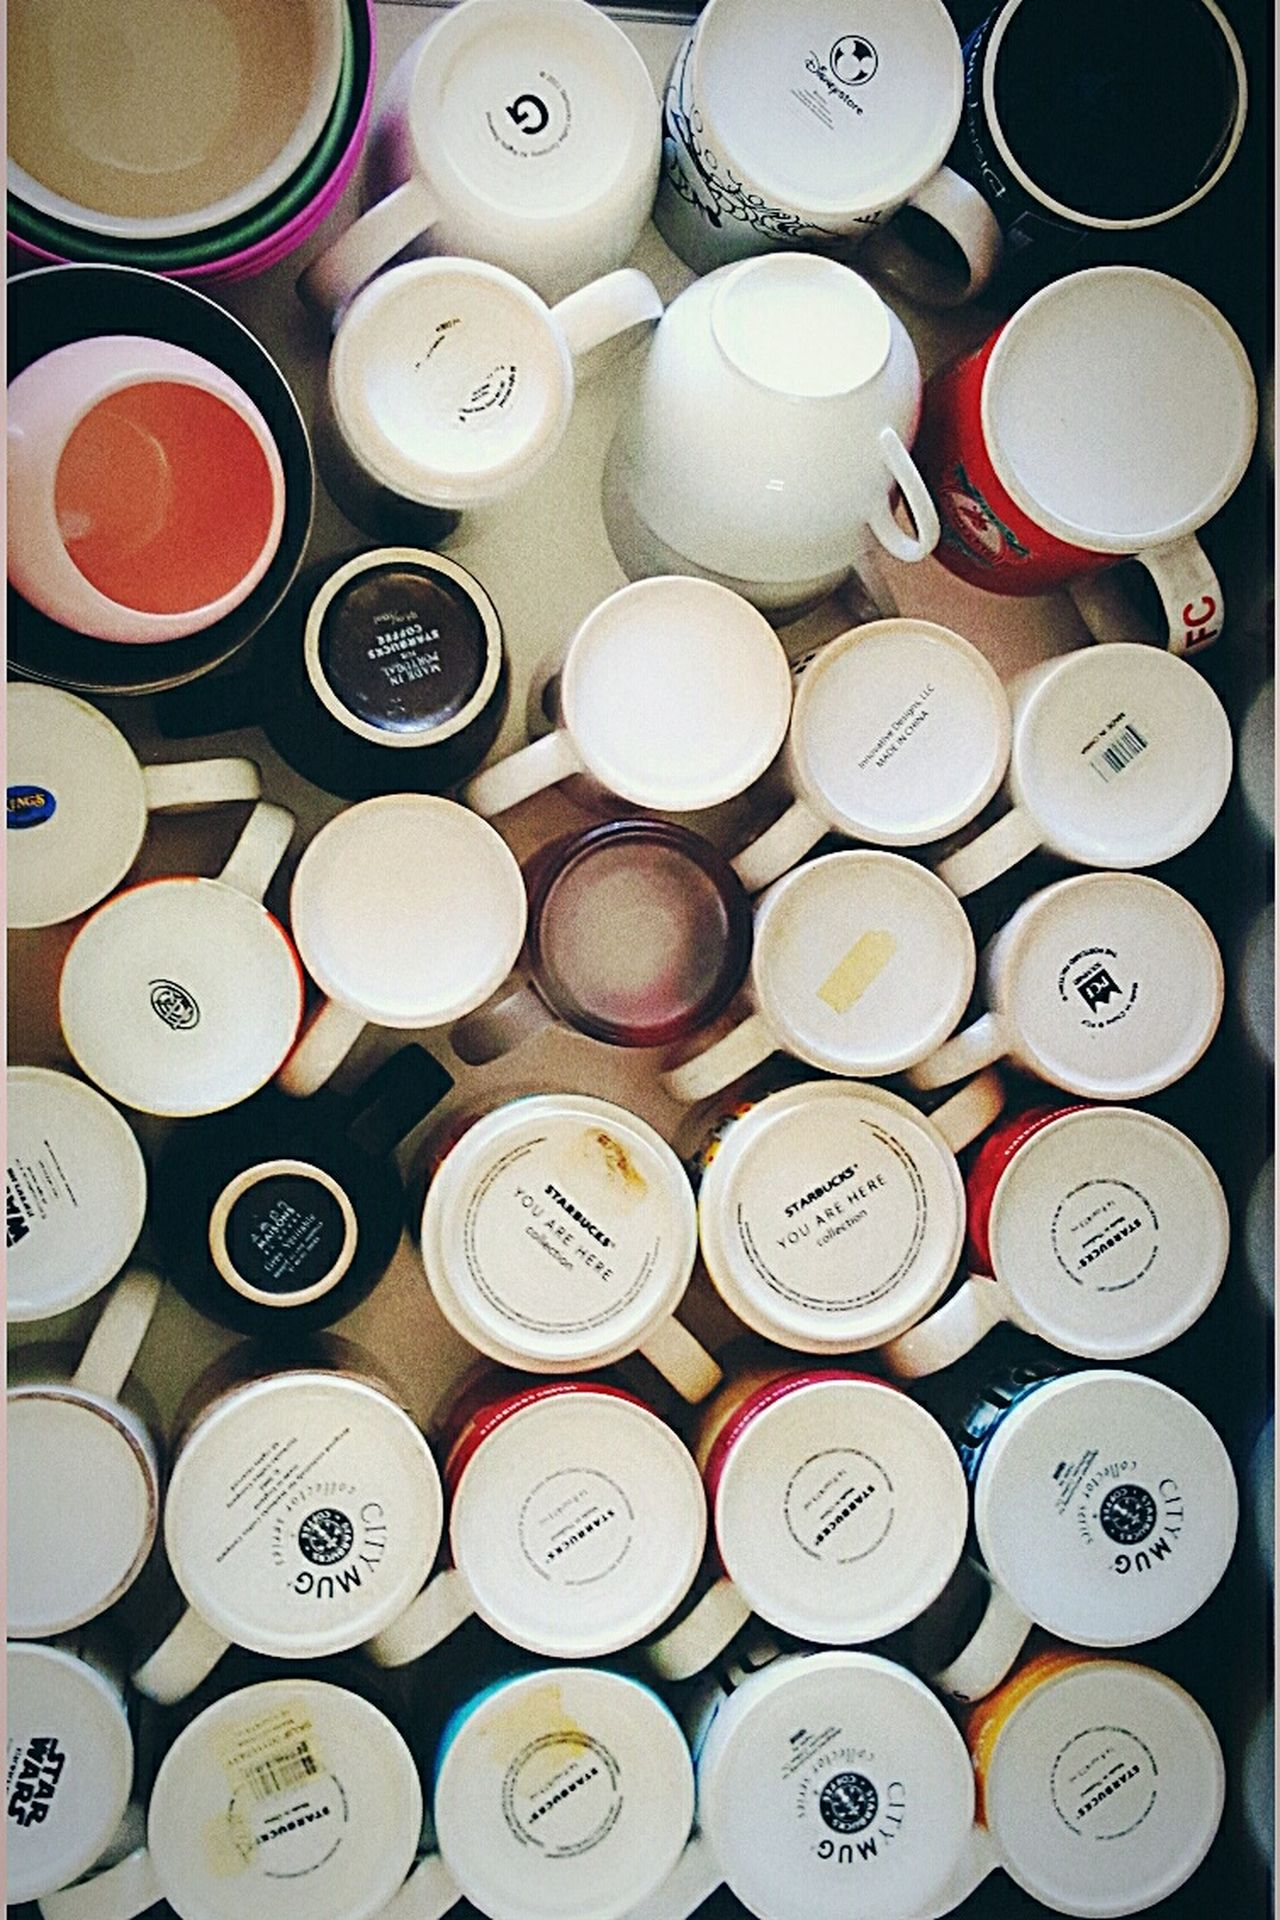 Taking Photos Mugs Mugsaddict Cup Of Coffee Cup Of Tea Cupofcoffee Coffee Time Cups And Mugs Cupstarbucks Cupsofcoffee